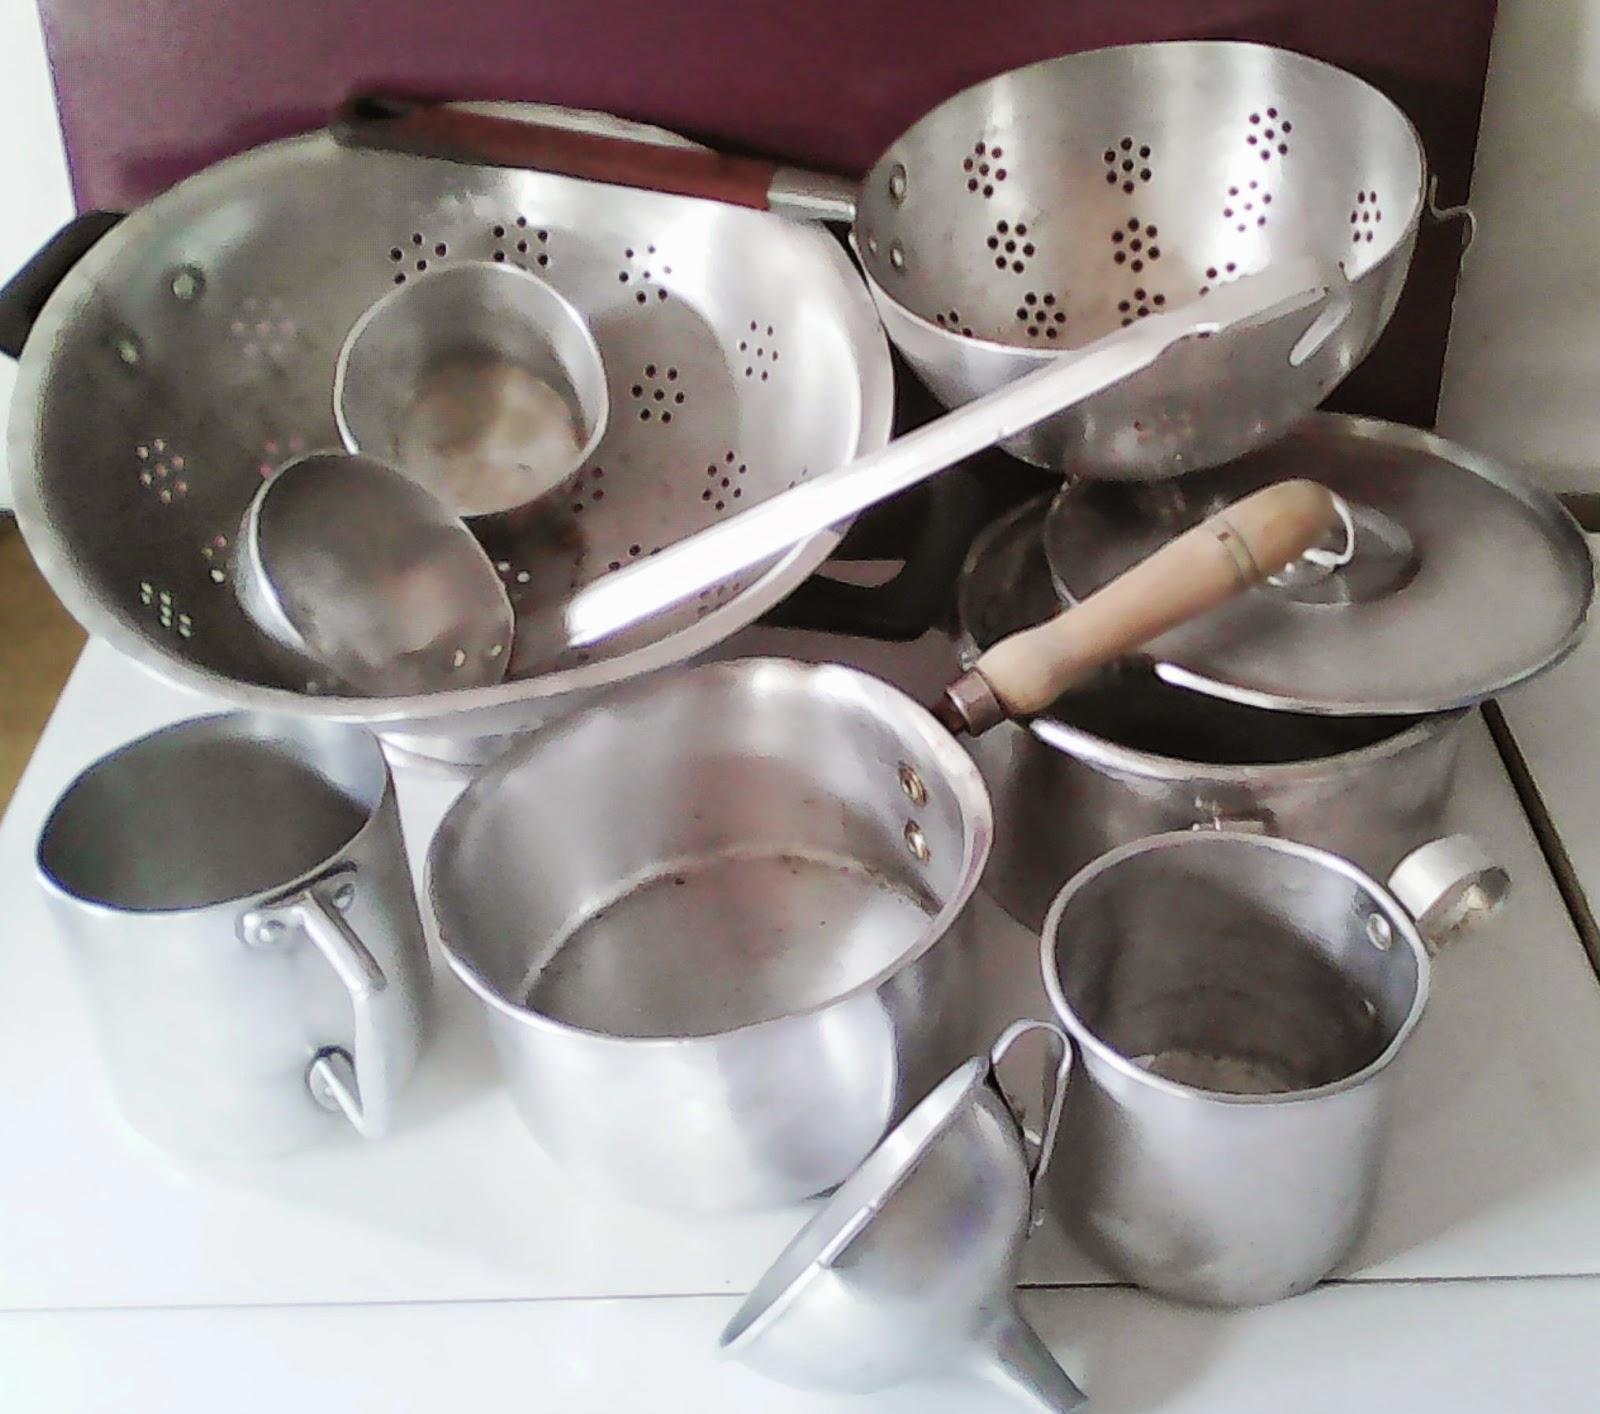 O desv n vintage do pereiro lote utensilios de cocina de for Utensilios de cocina de aluminio